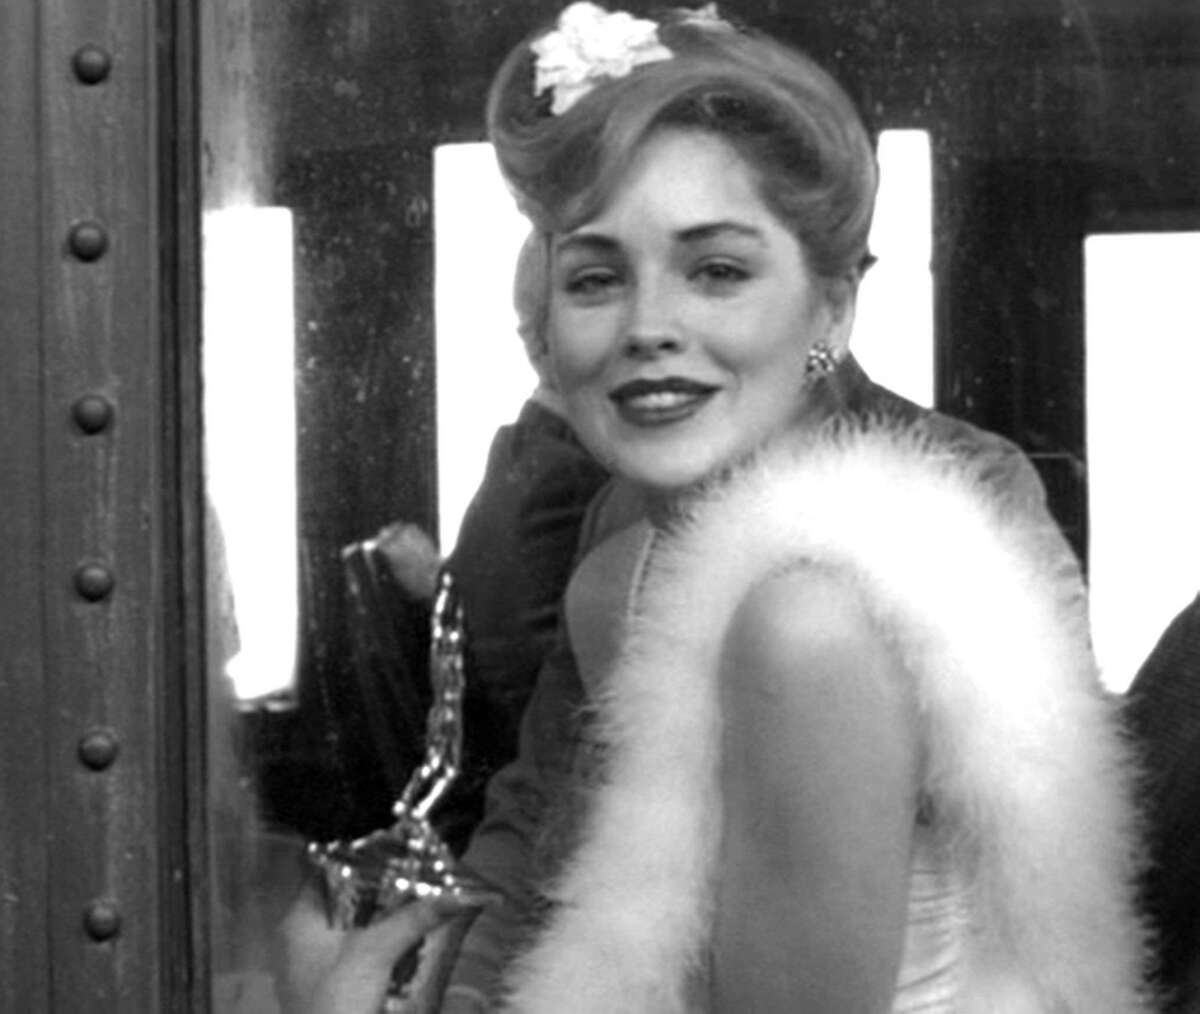 No. 1. She had a brief, nonspeaking role in a train coach scene in Woody Allen's